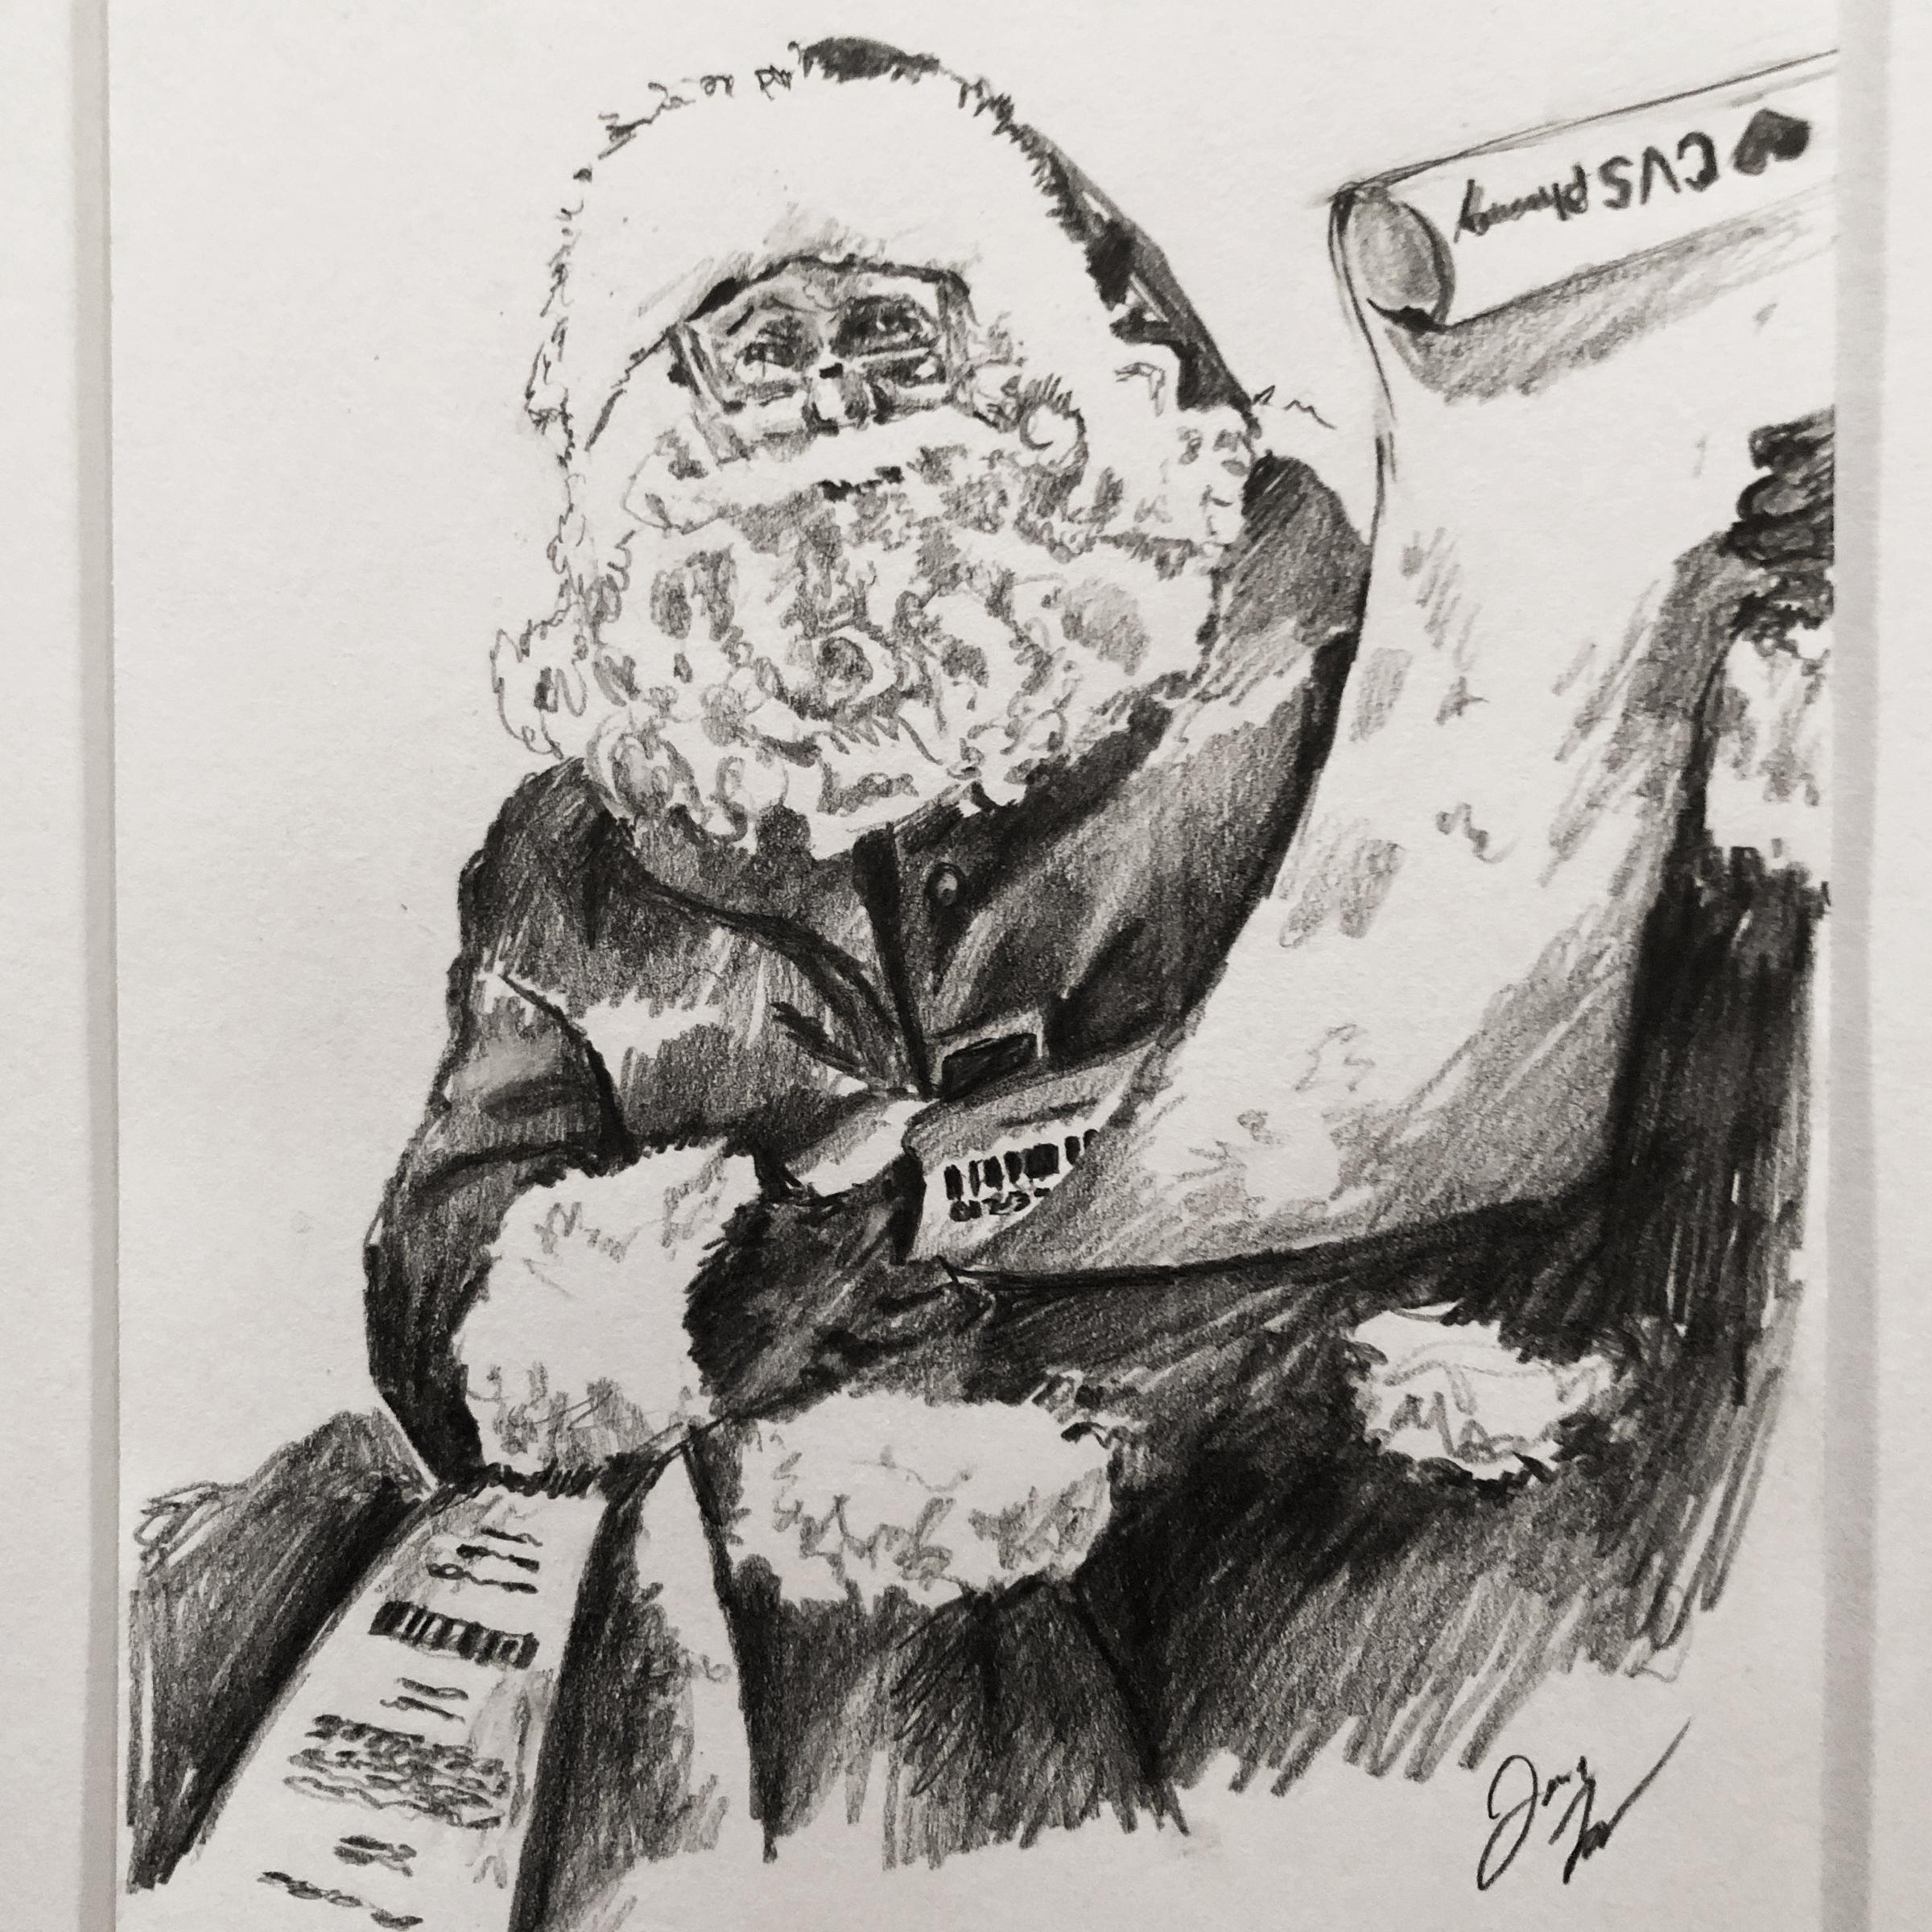 long-cvs-reciept-christmas-post-by-jordan-fretz.jpg